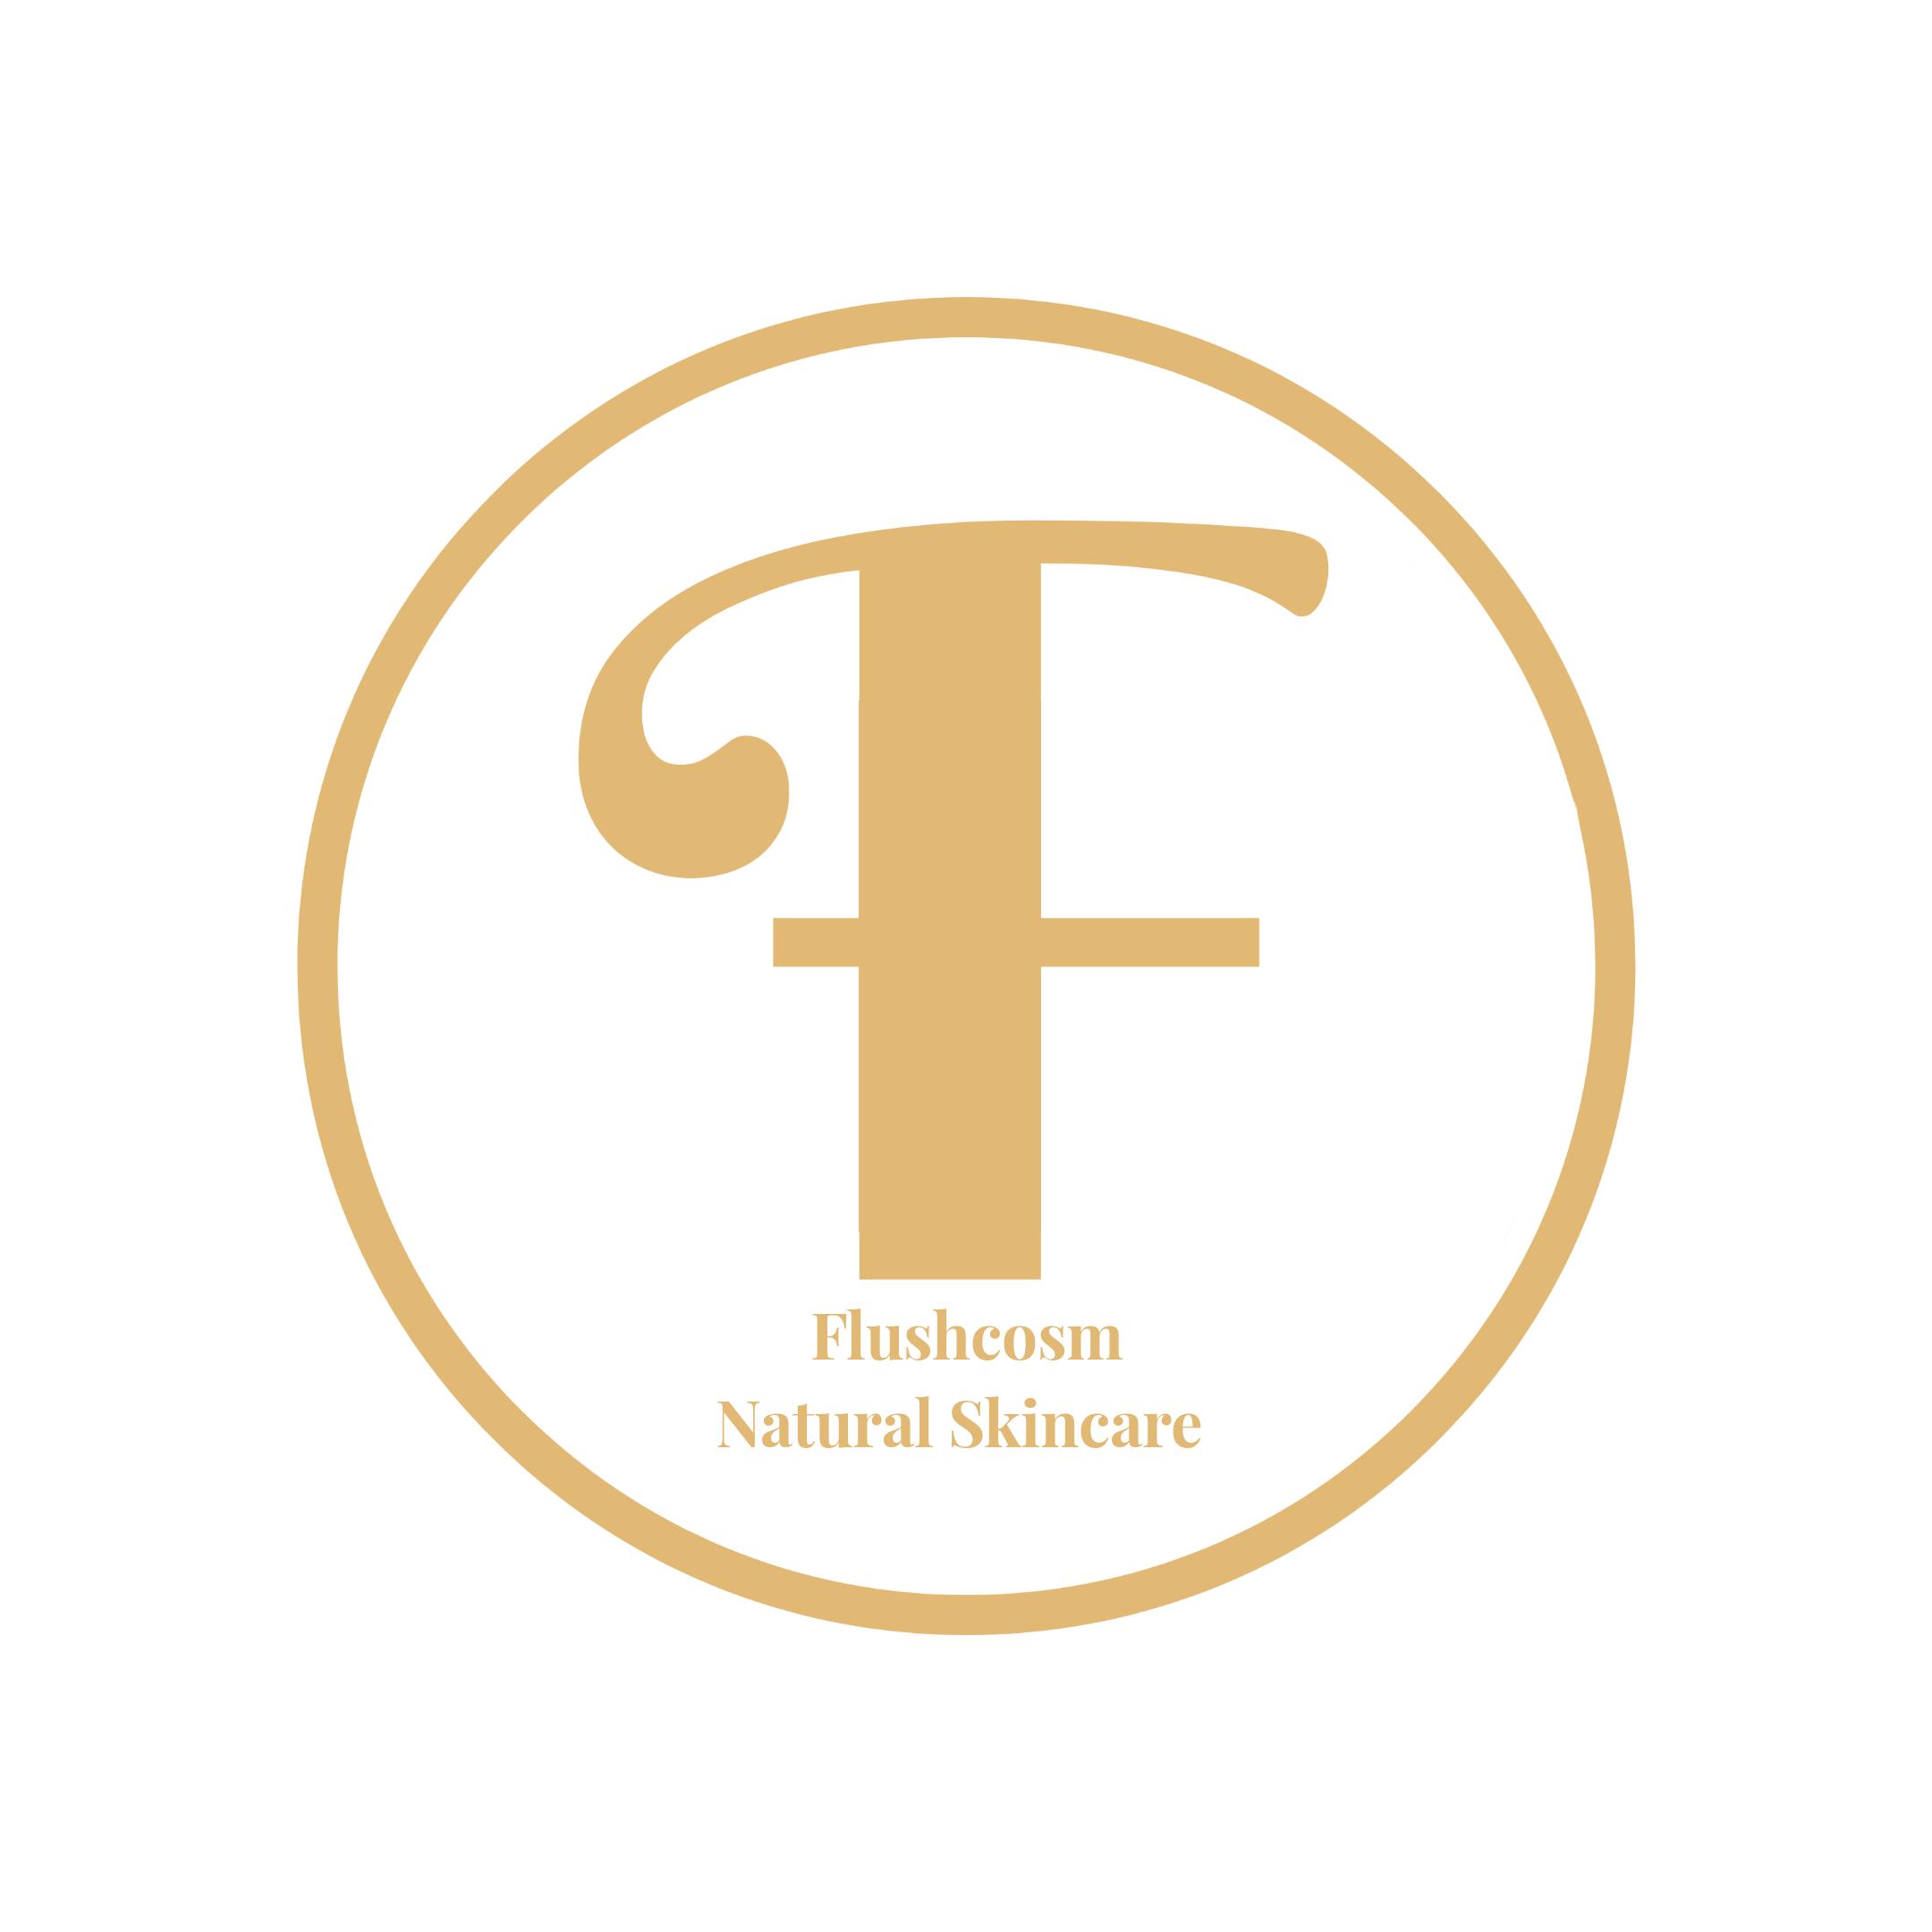 Flushcosm Natural Skincare